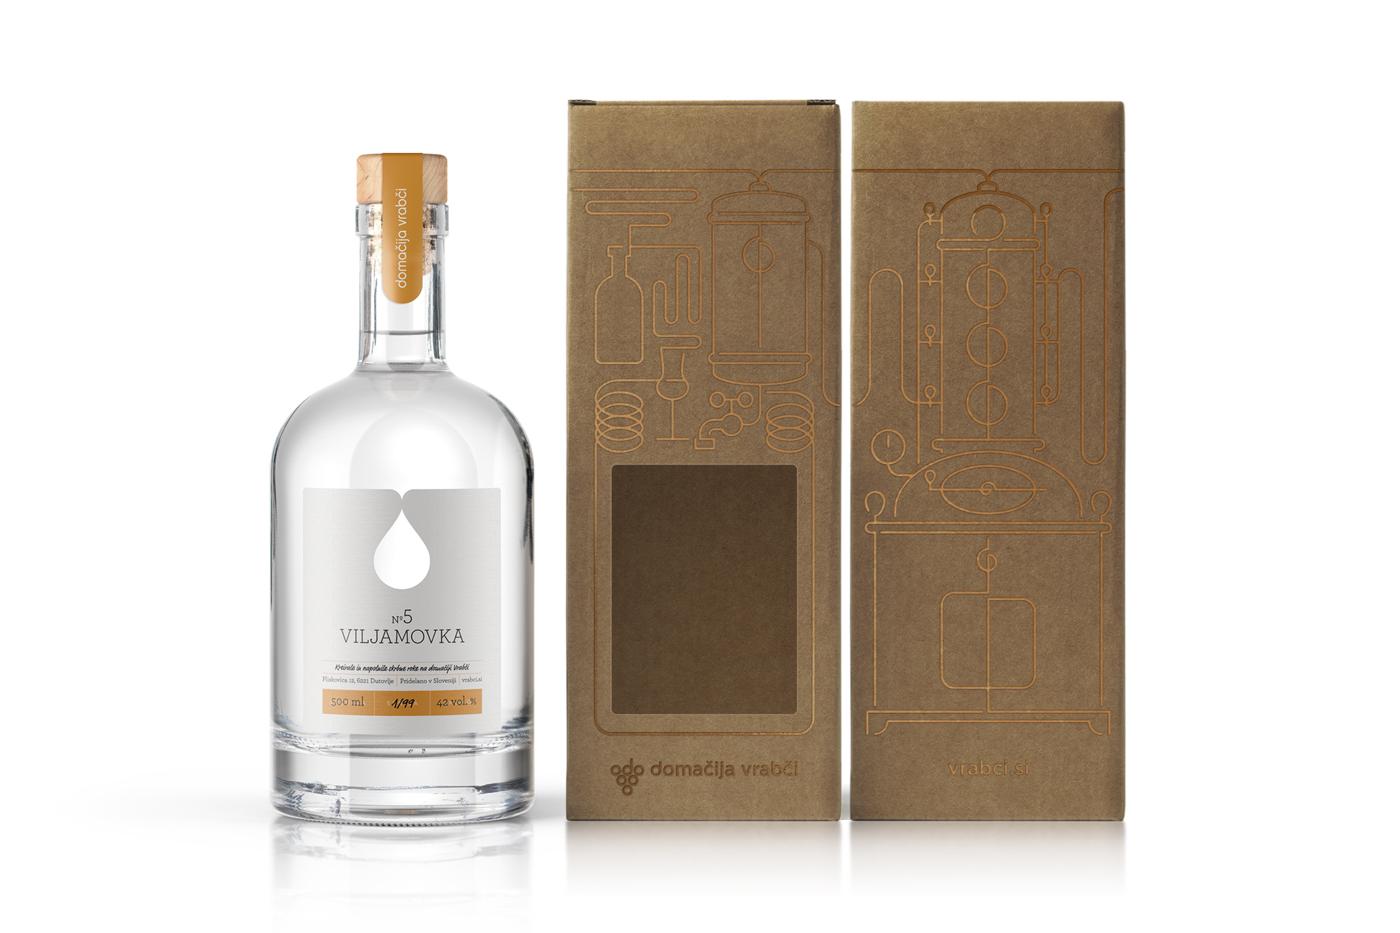 DOMAINE VRABCI / Spirits packaging design